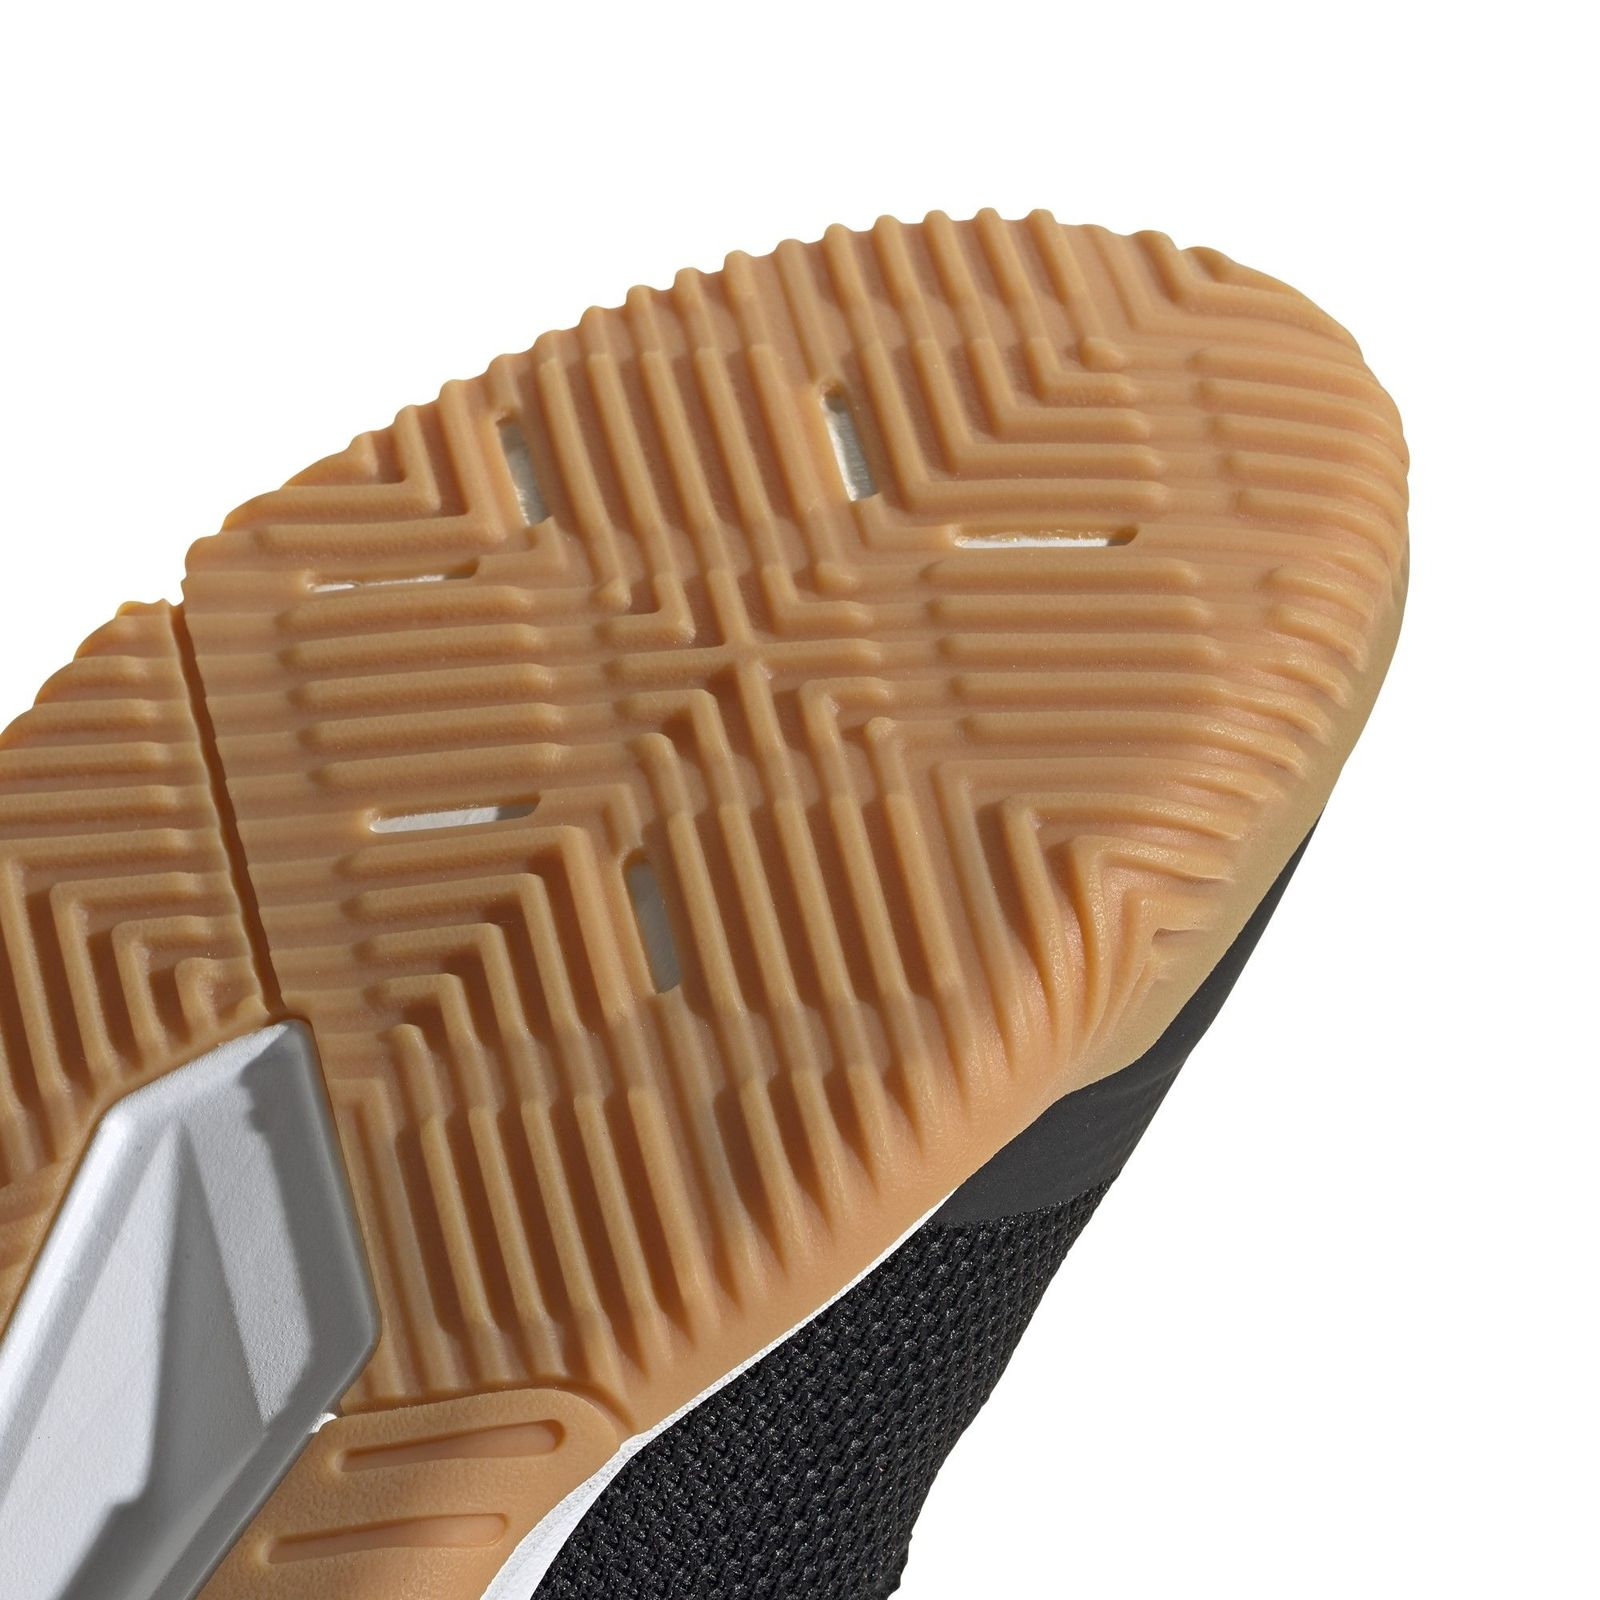 Adidas Court Team Bounce - Black (US 10.5) image